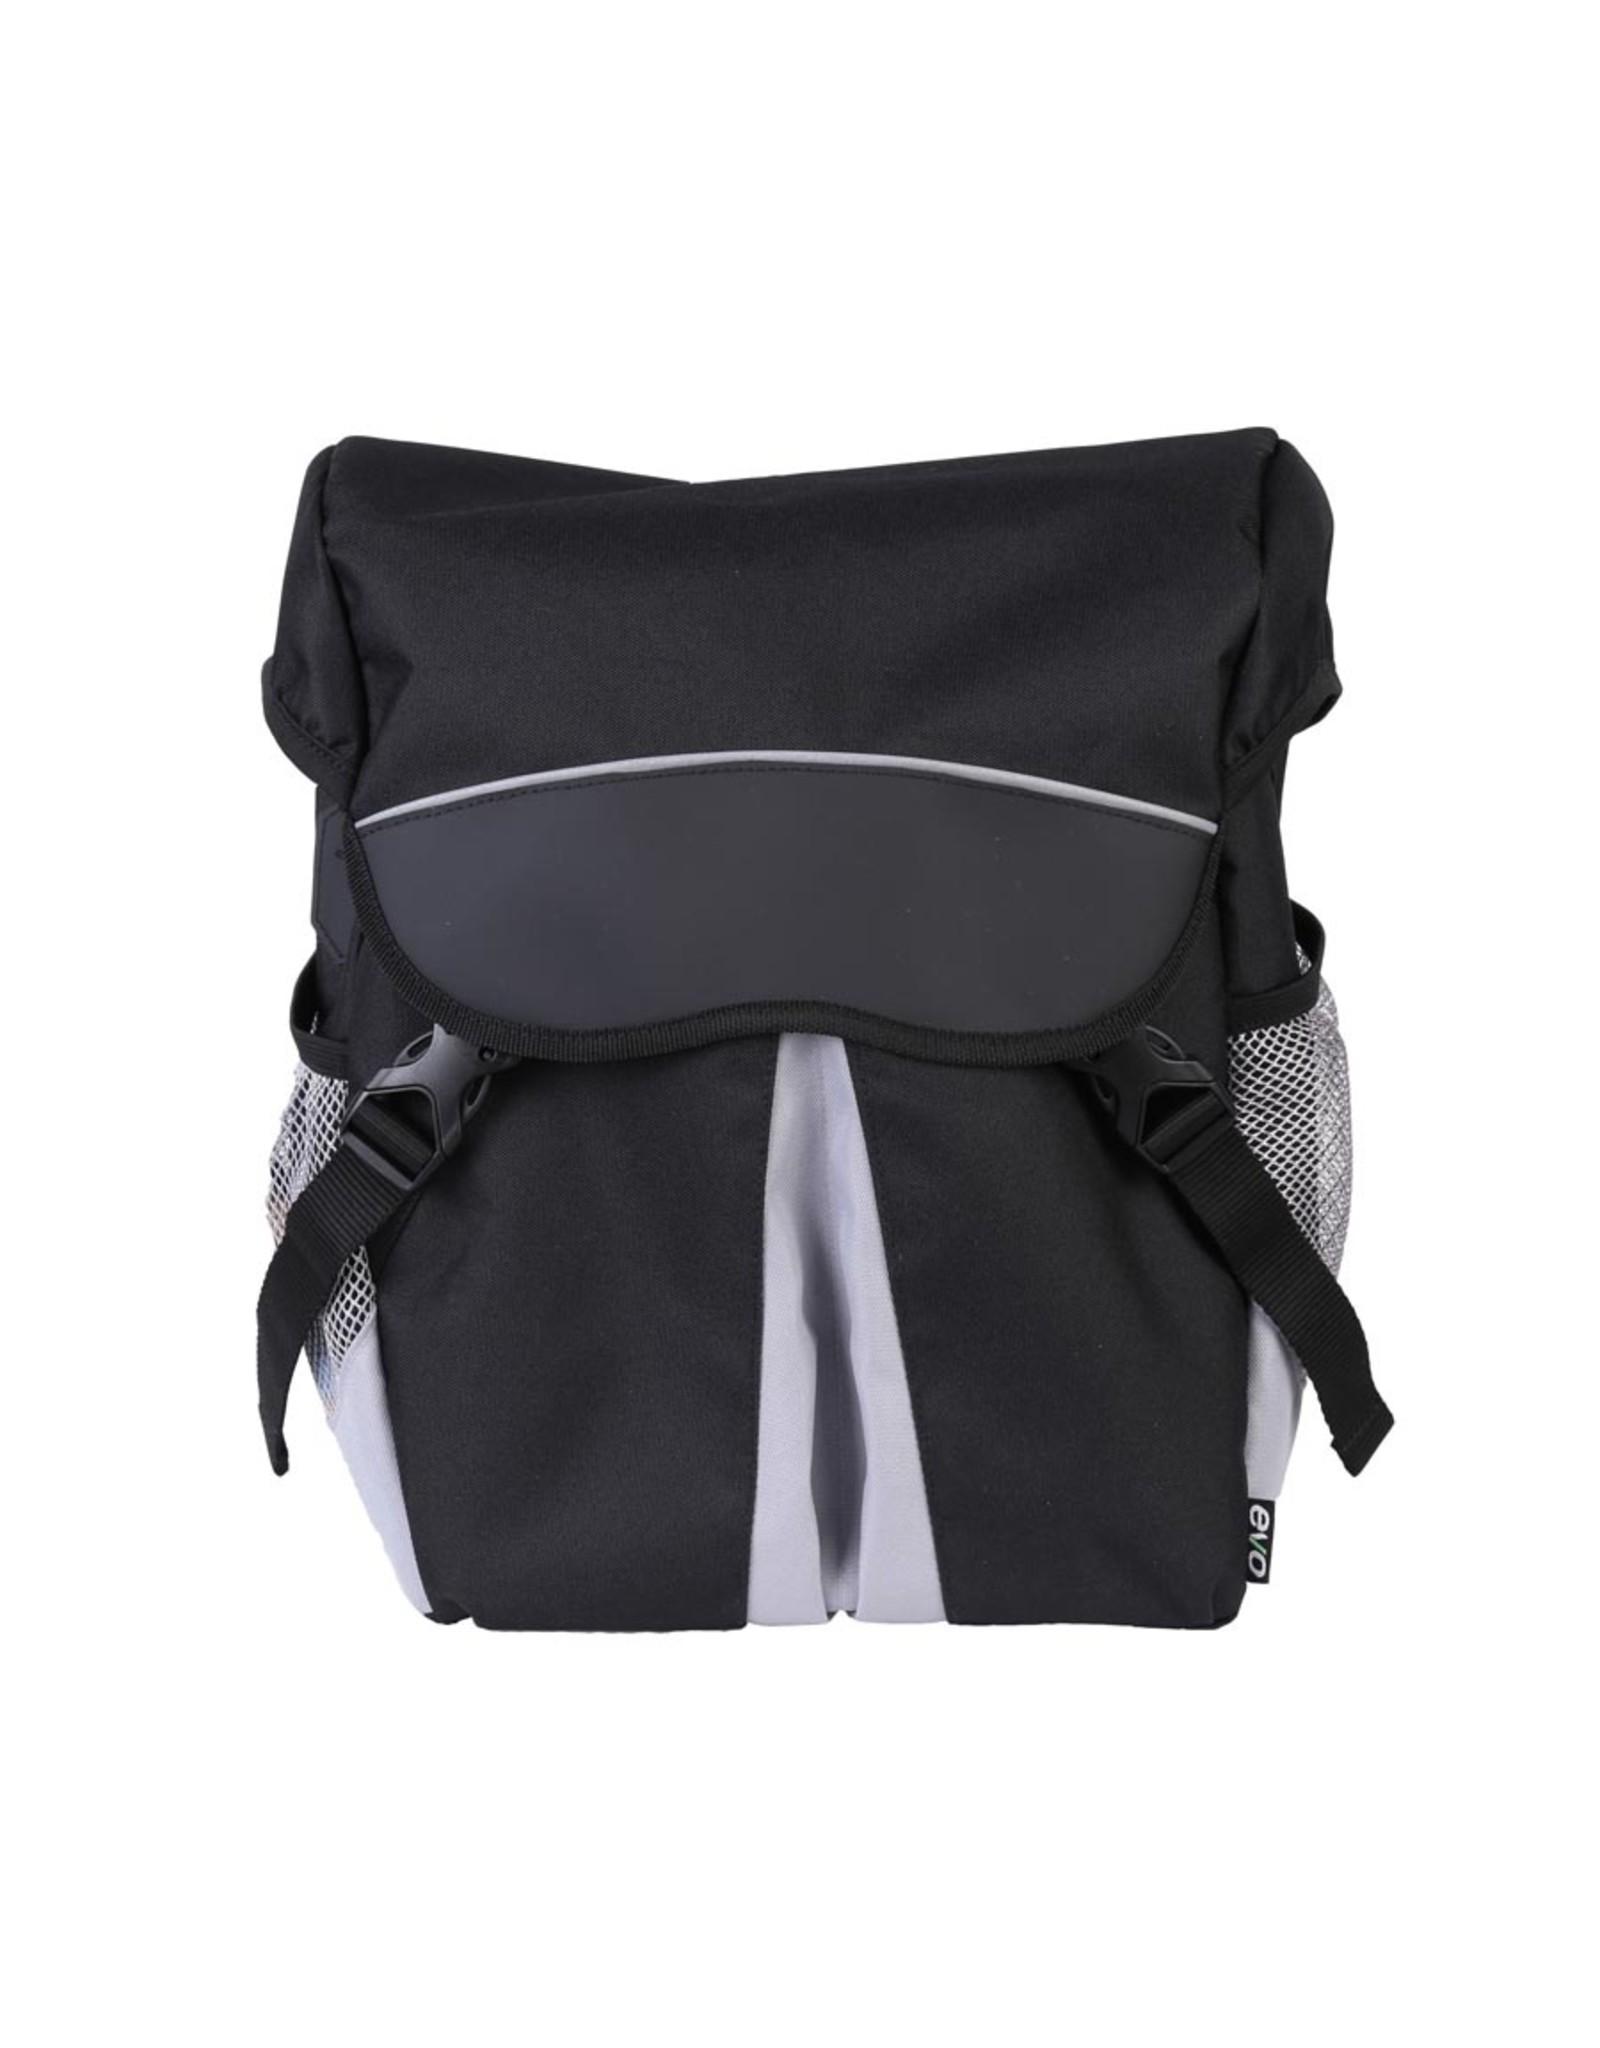 Evo, Clutch, Pannier Bag Set